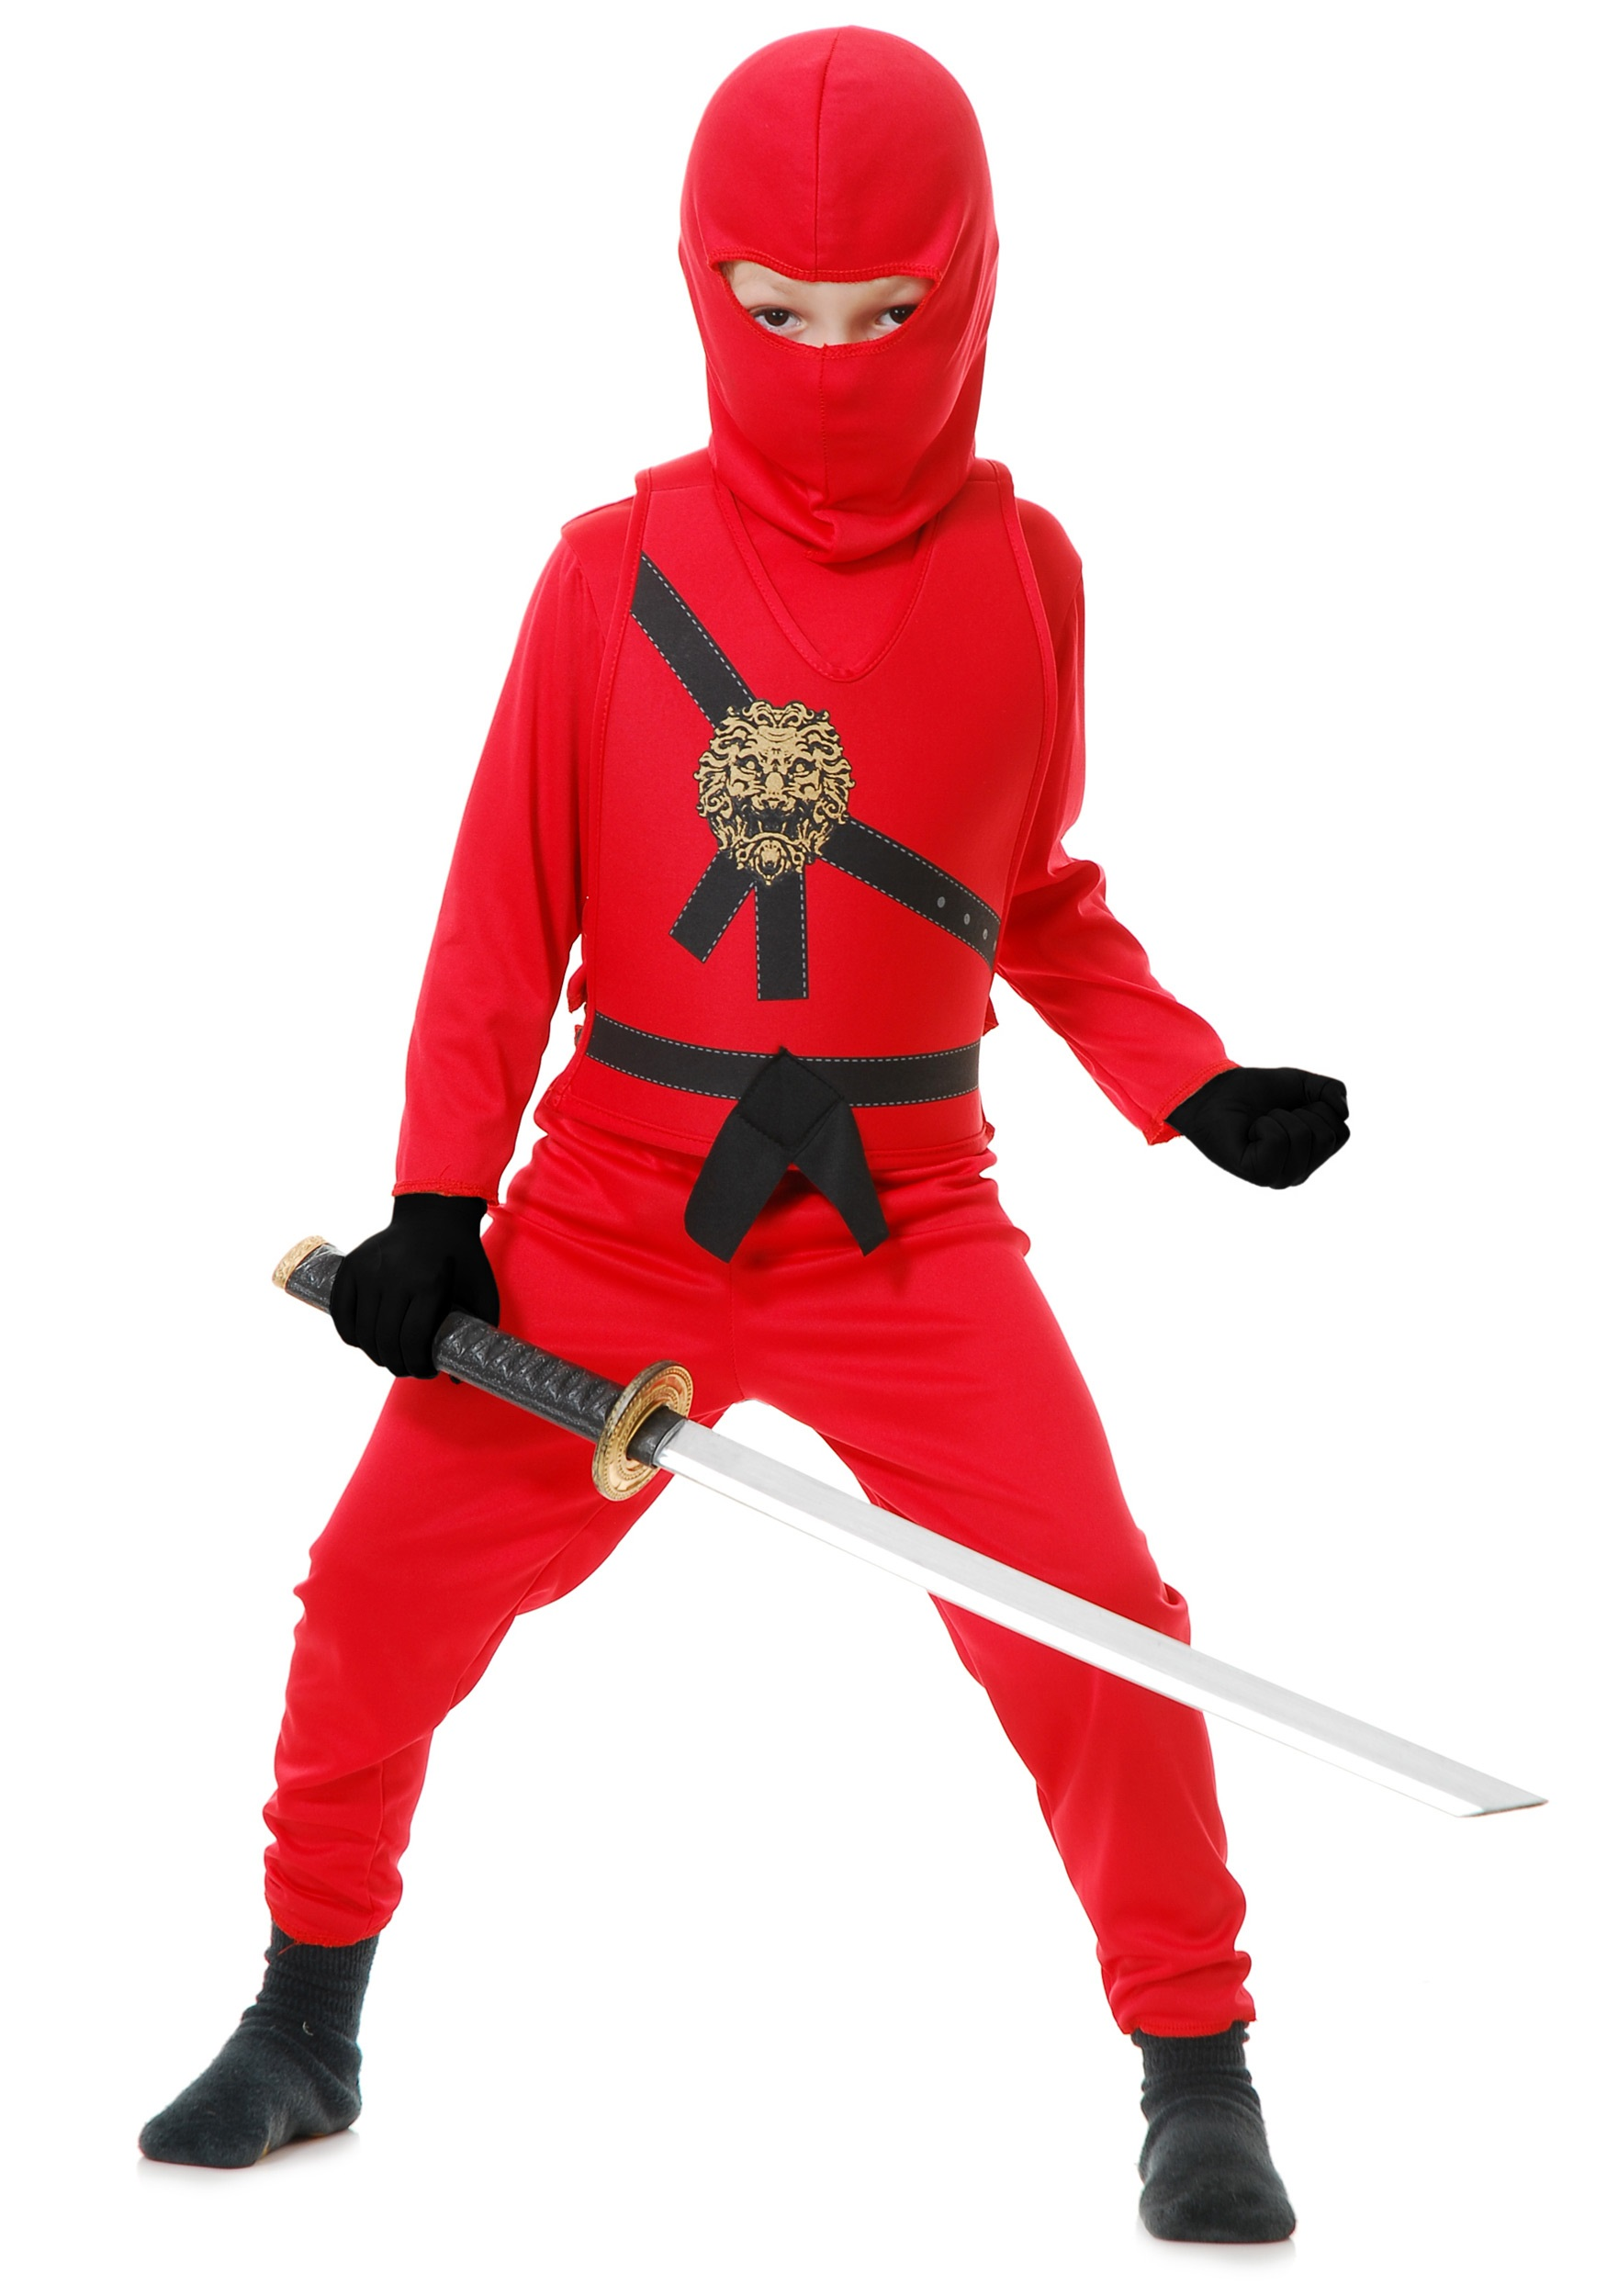 Boys red ninja master warrior costume red ninja master warrior boys costume solutioingenieria Images